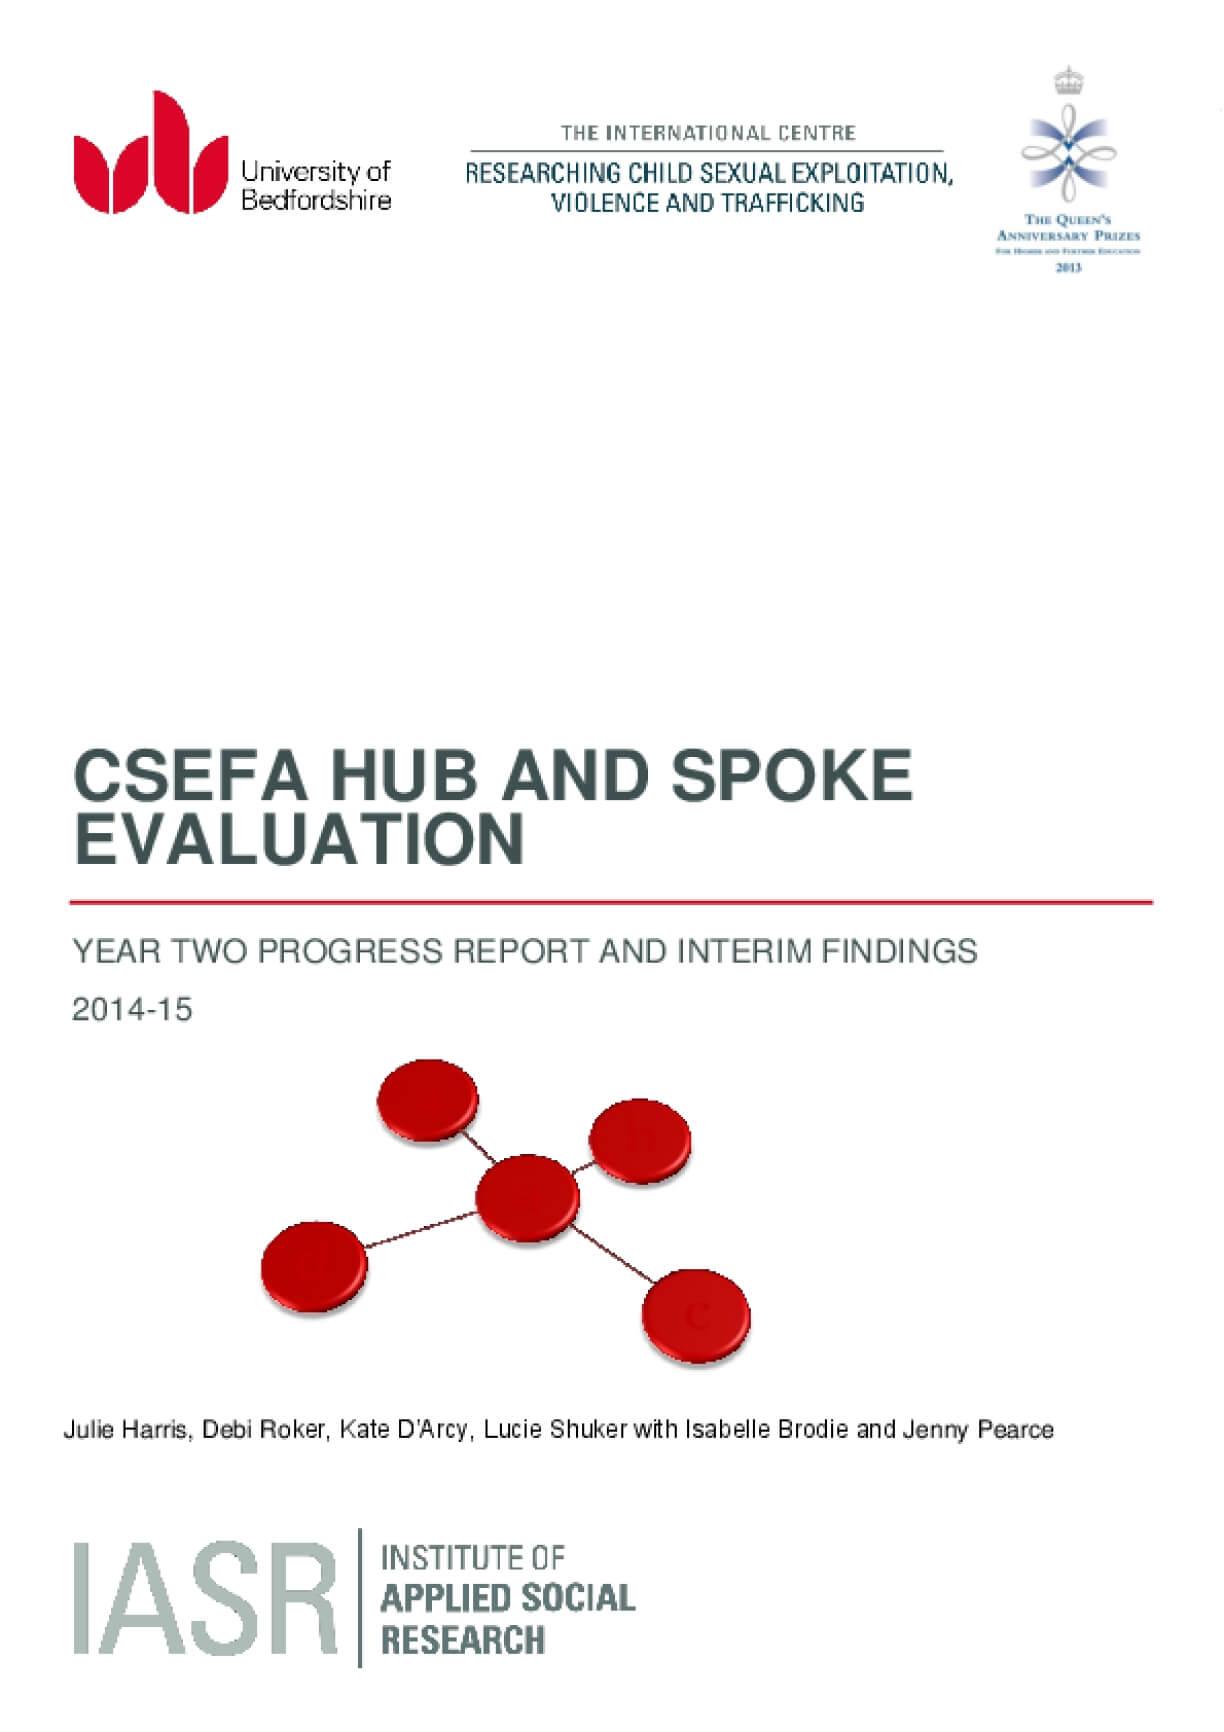 CSEFA Hub and Spoke Evaluation